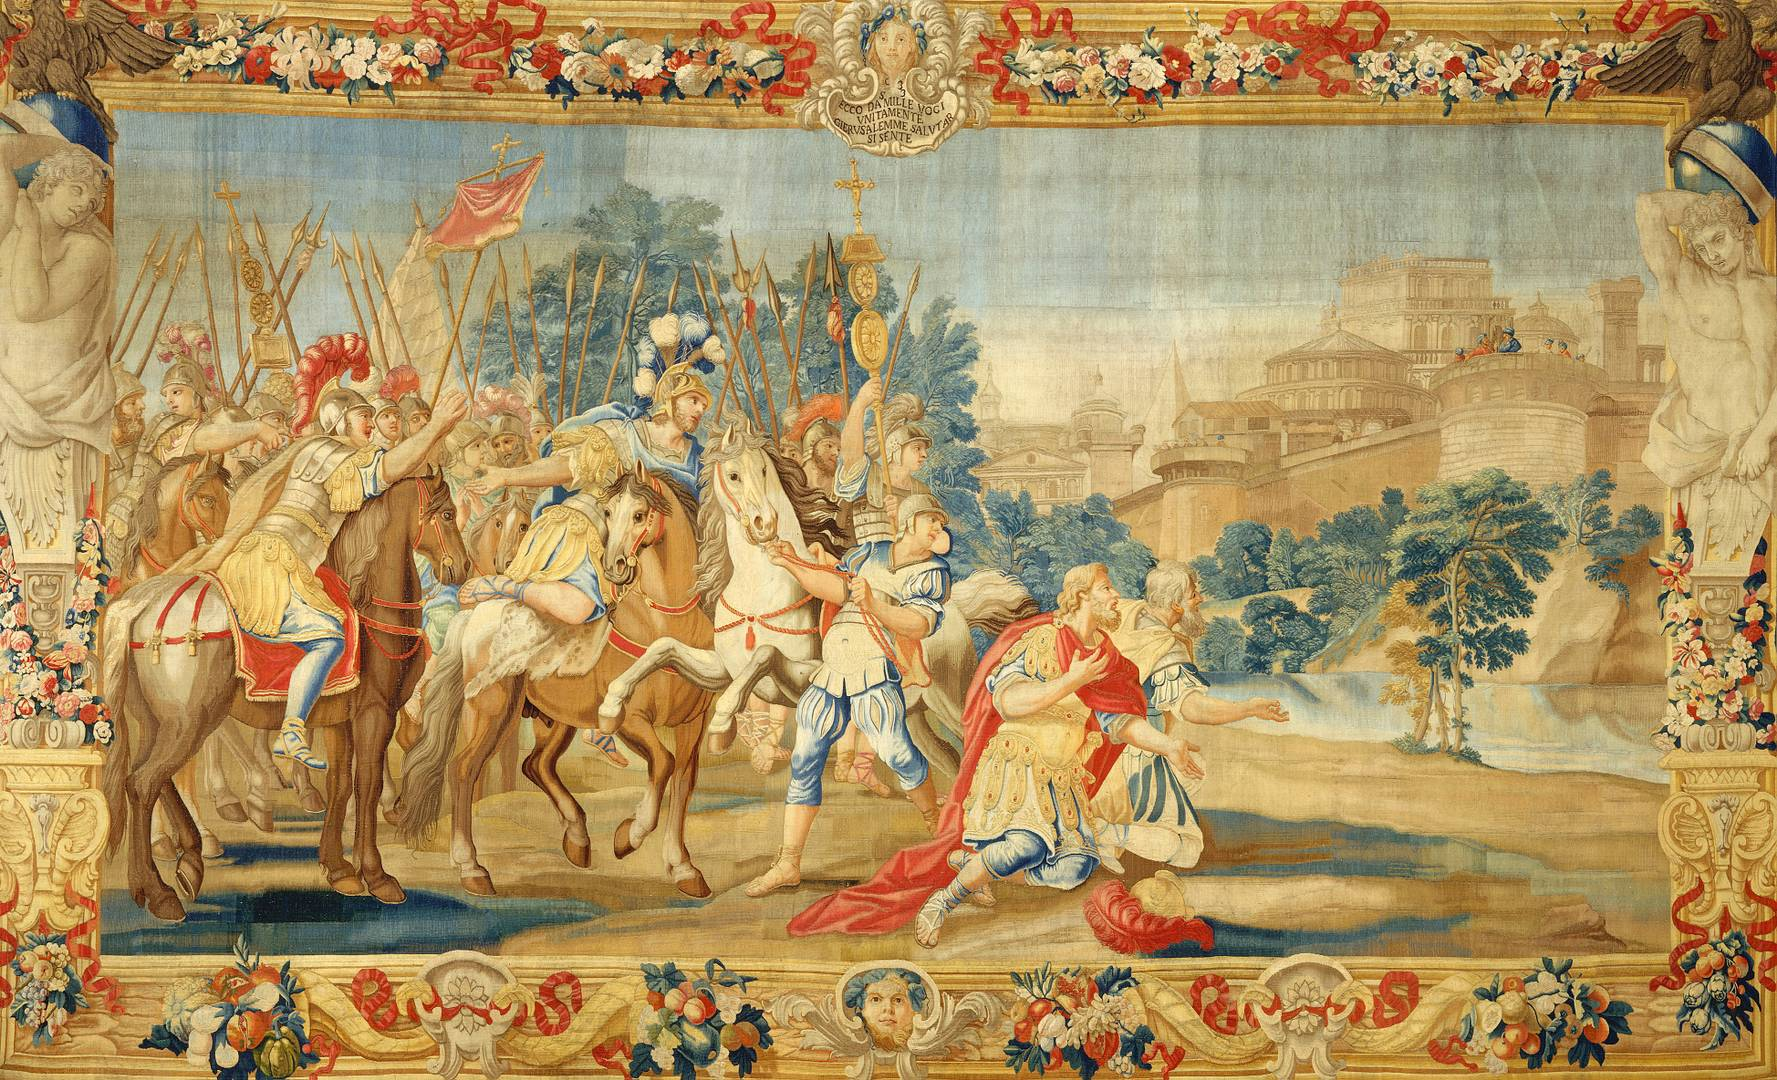 По эскизу Доменико Парадизи. Крестоносцы дошли до Иерусалима. Рисунок около 1689–1793, вышивка 1732–1739